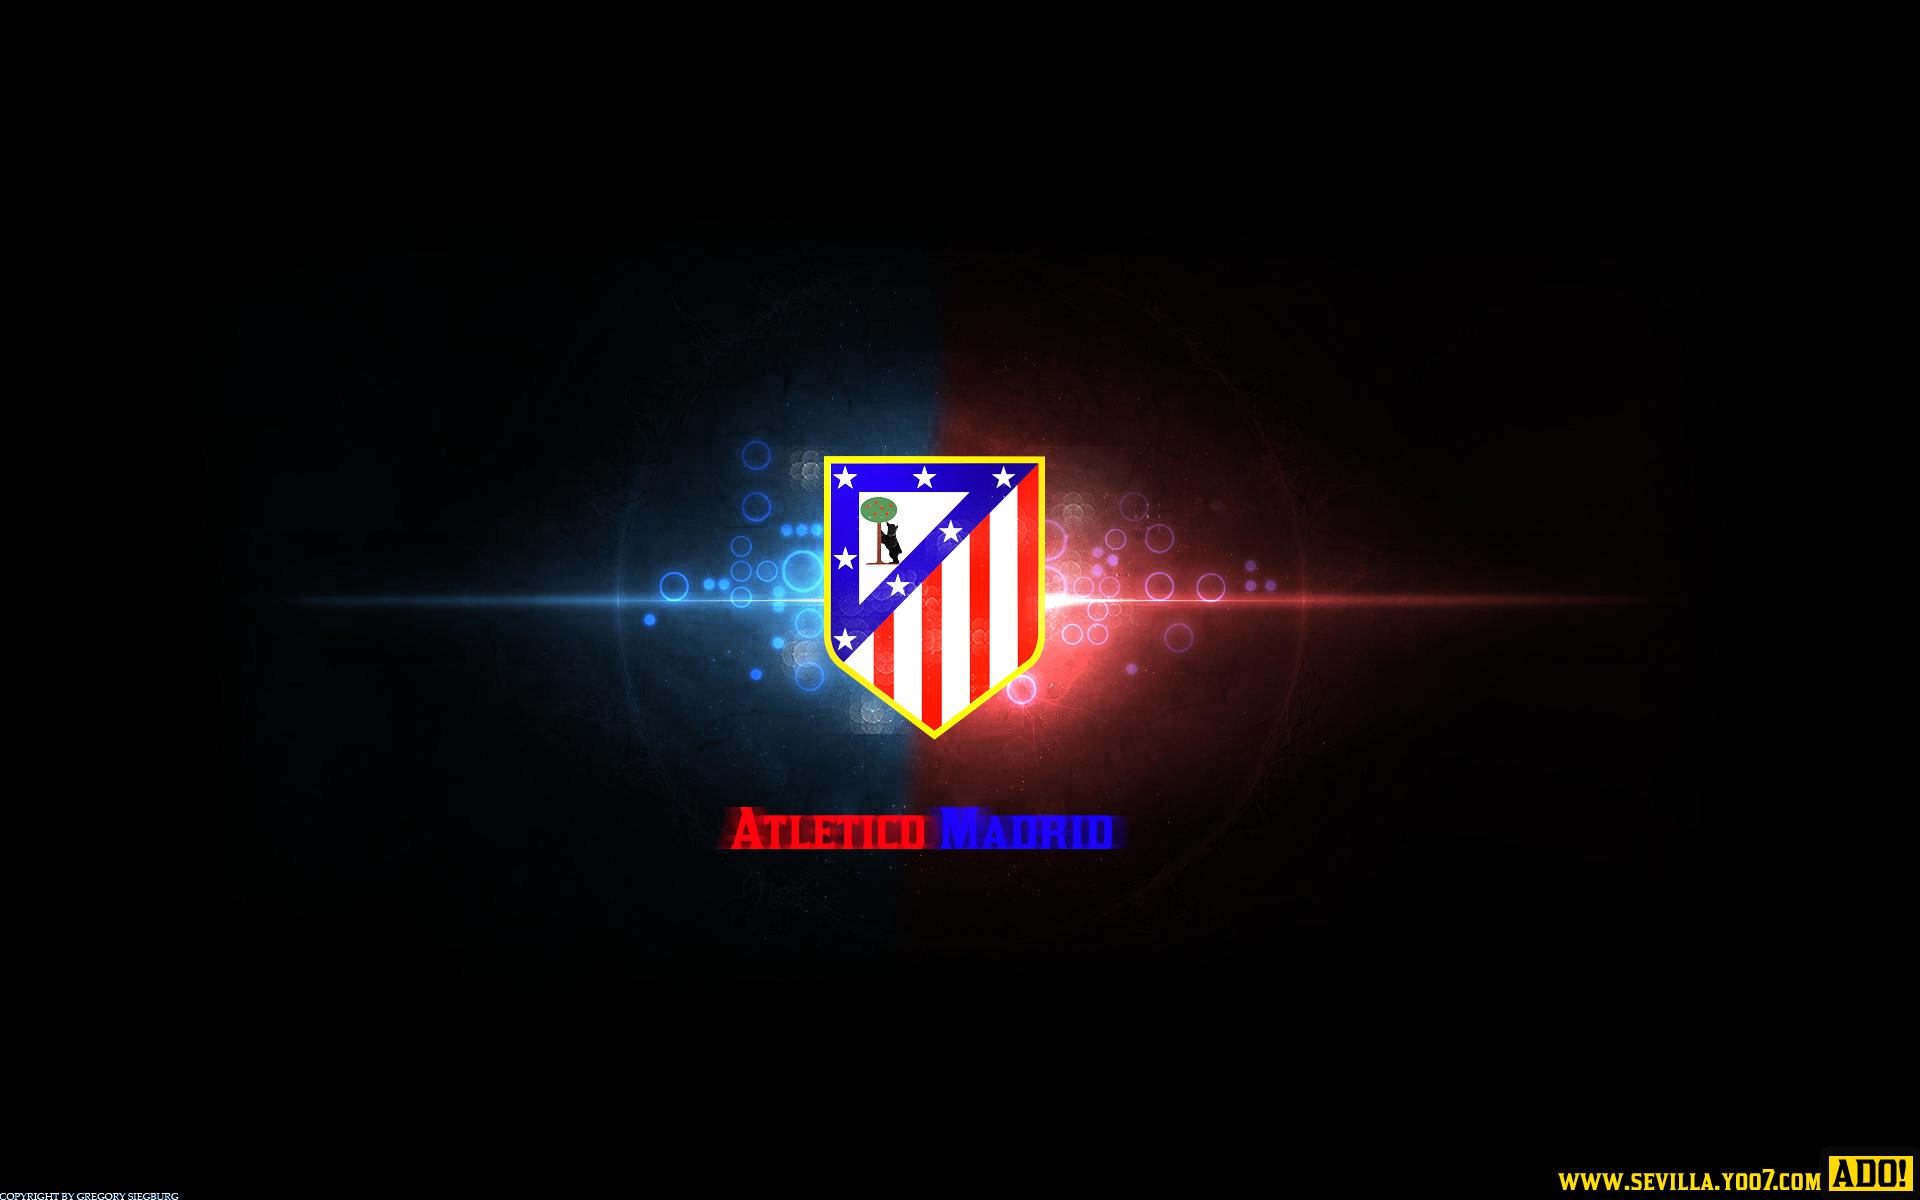 Atletico Madrid Wallpaper 1920x1200